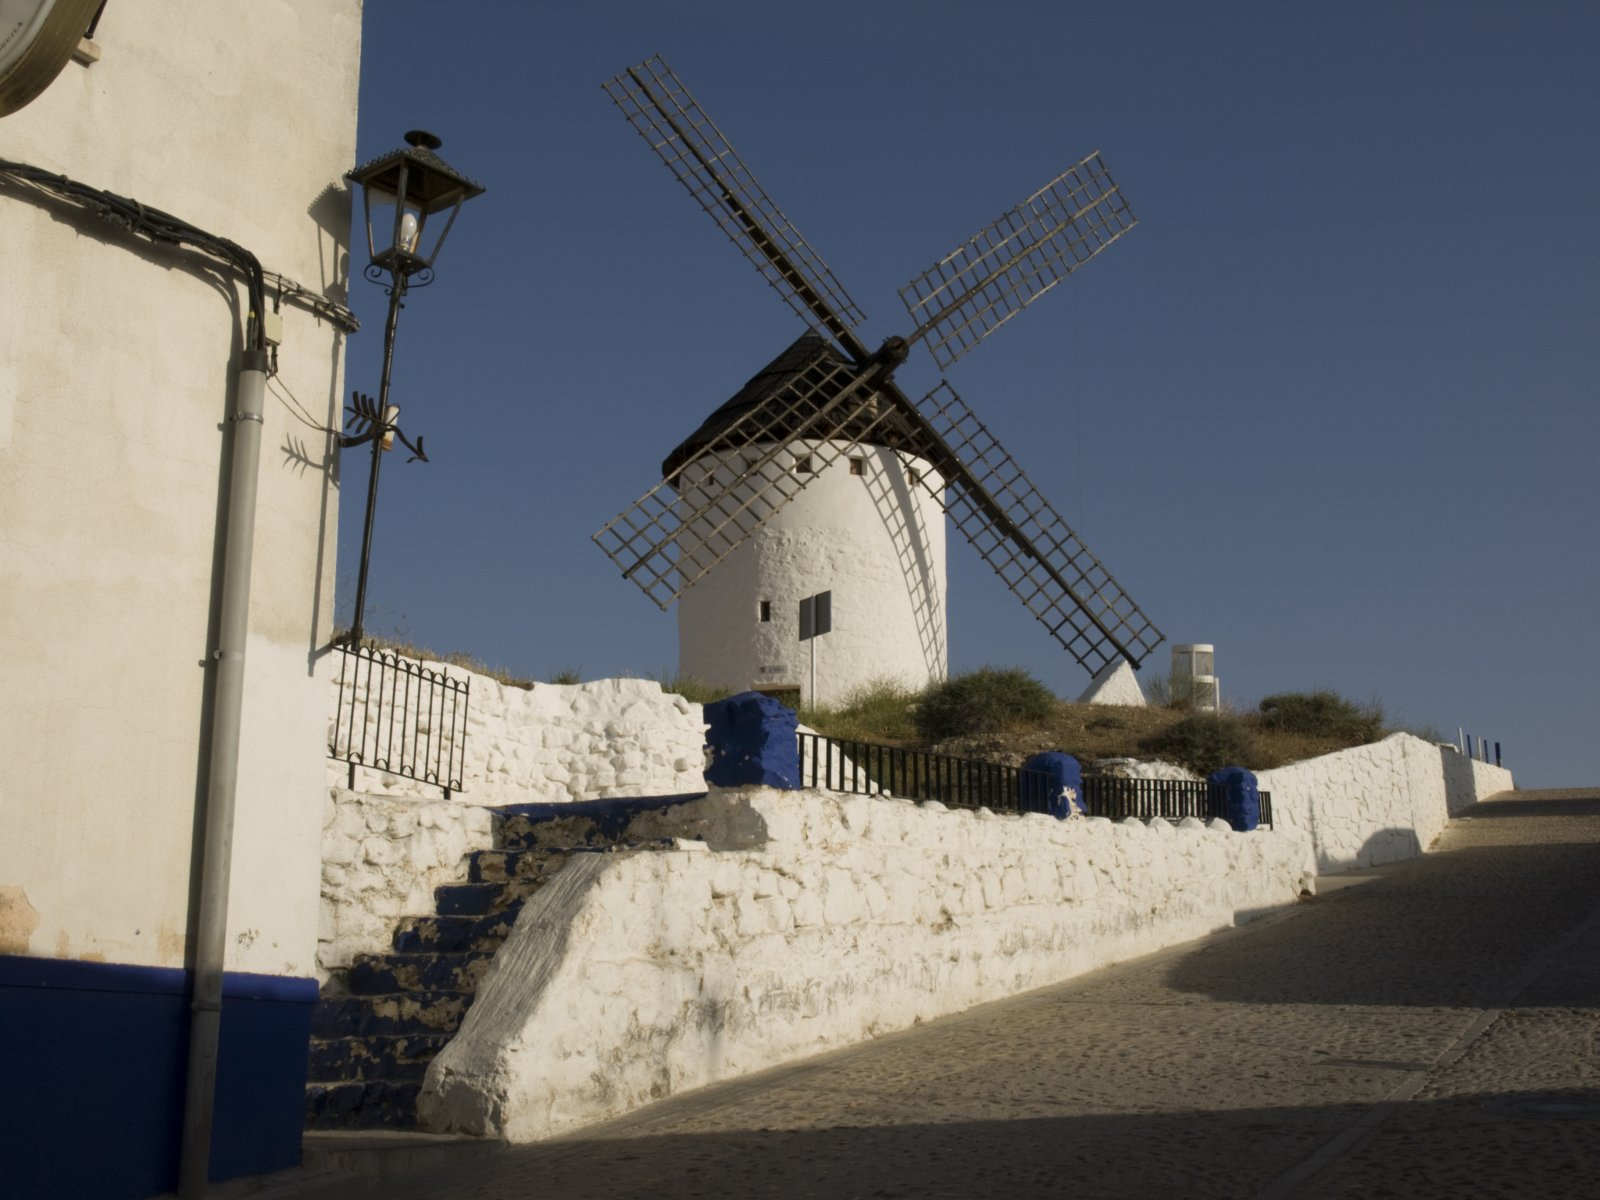 Windmill at Campo de Criptana, Spain